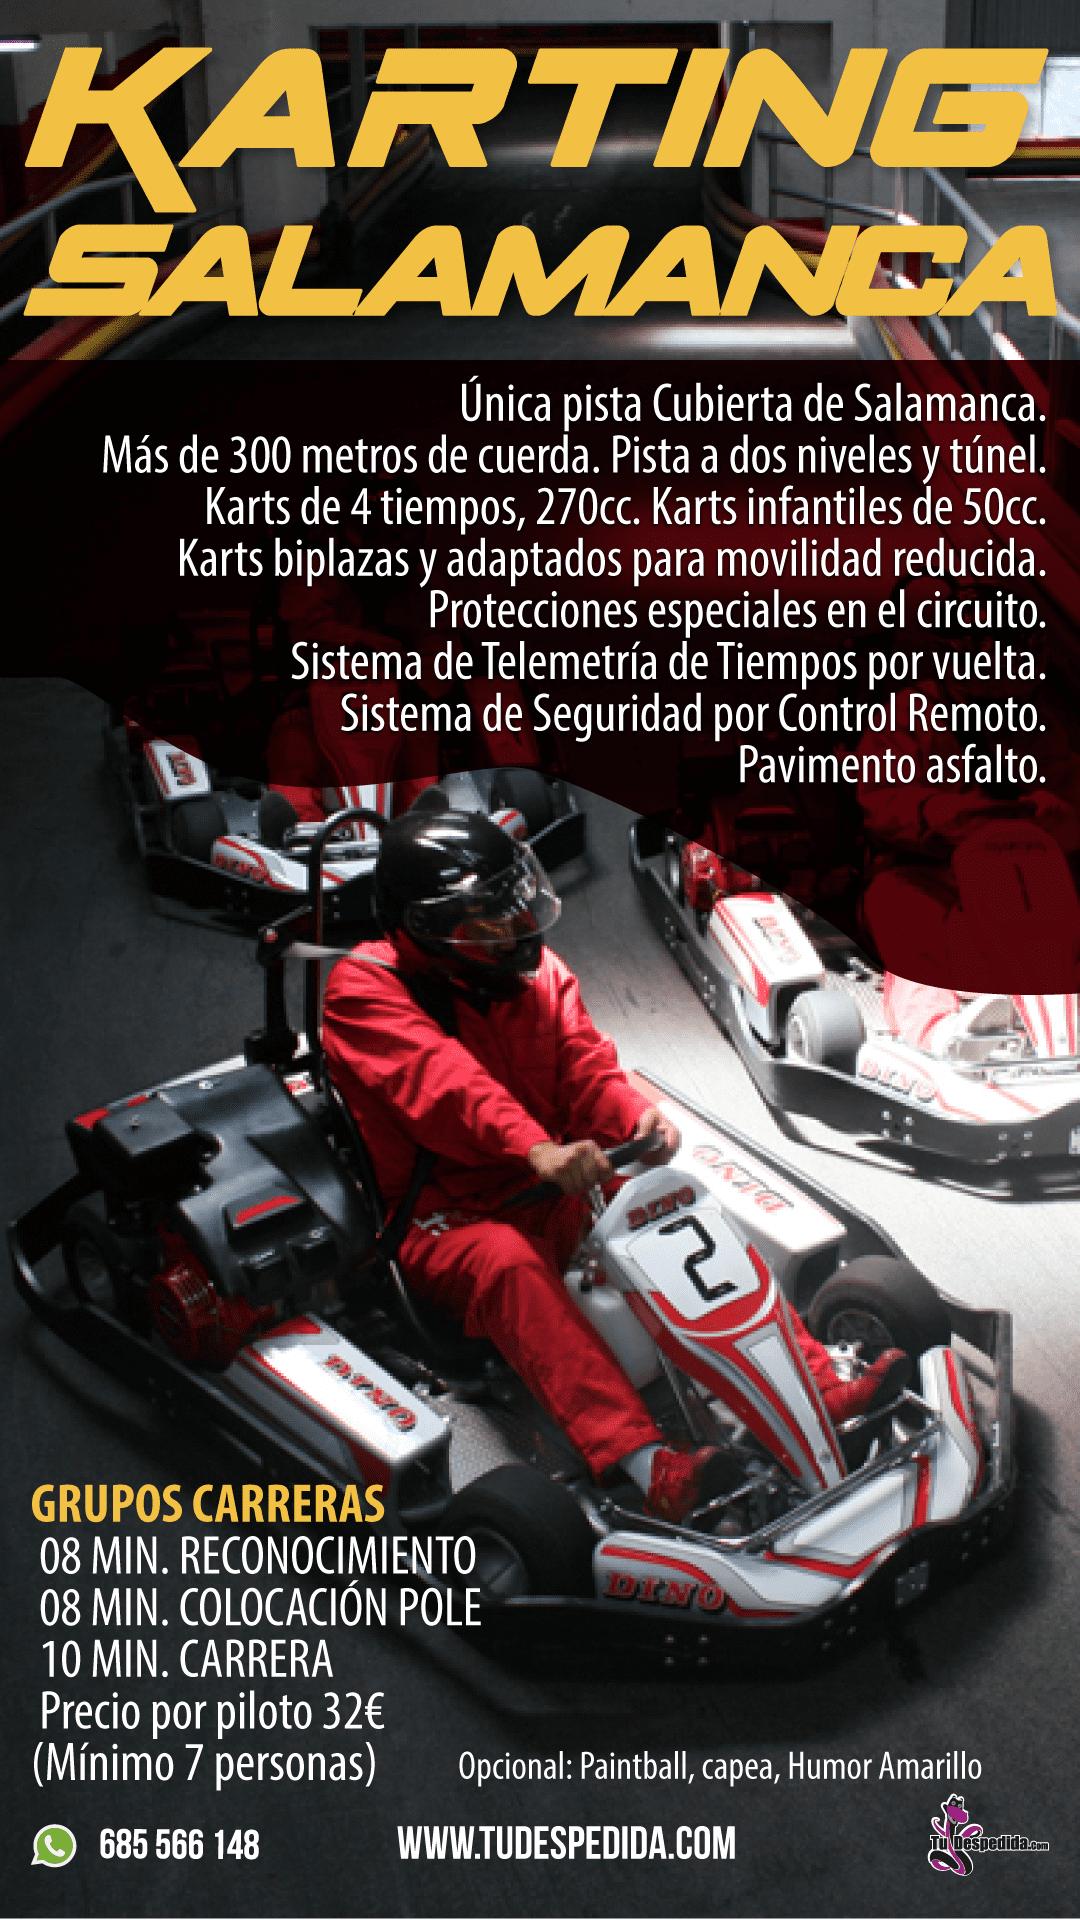 Karting Salamanca